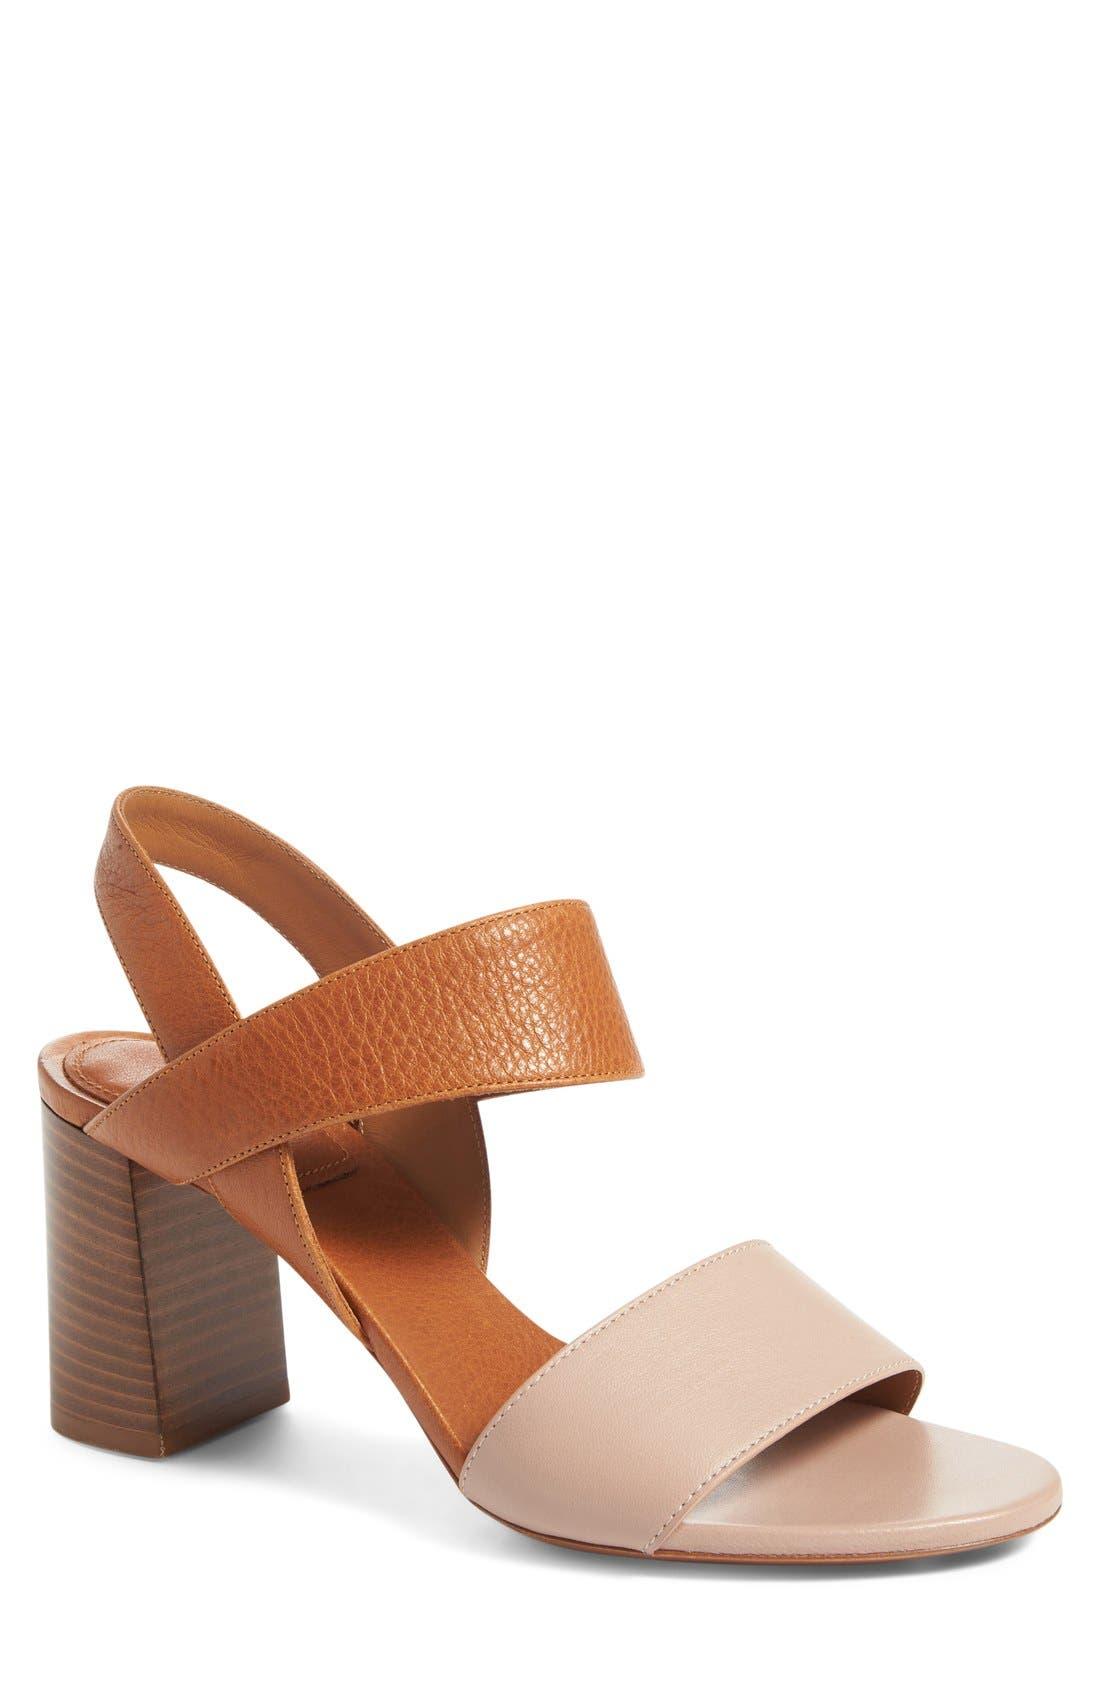 Alternate Image 1 Selected - Chloé Mia Block Heel Sandal (Women)